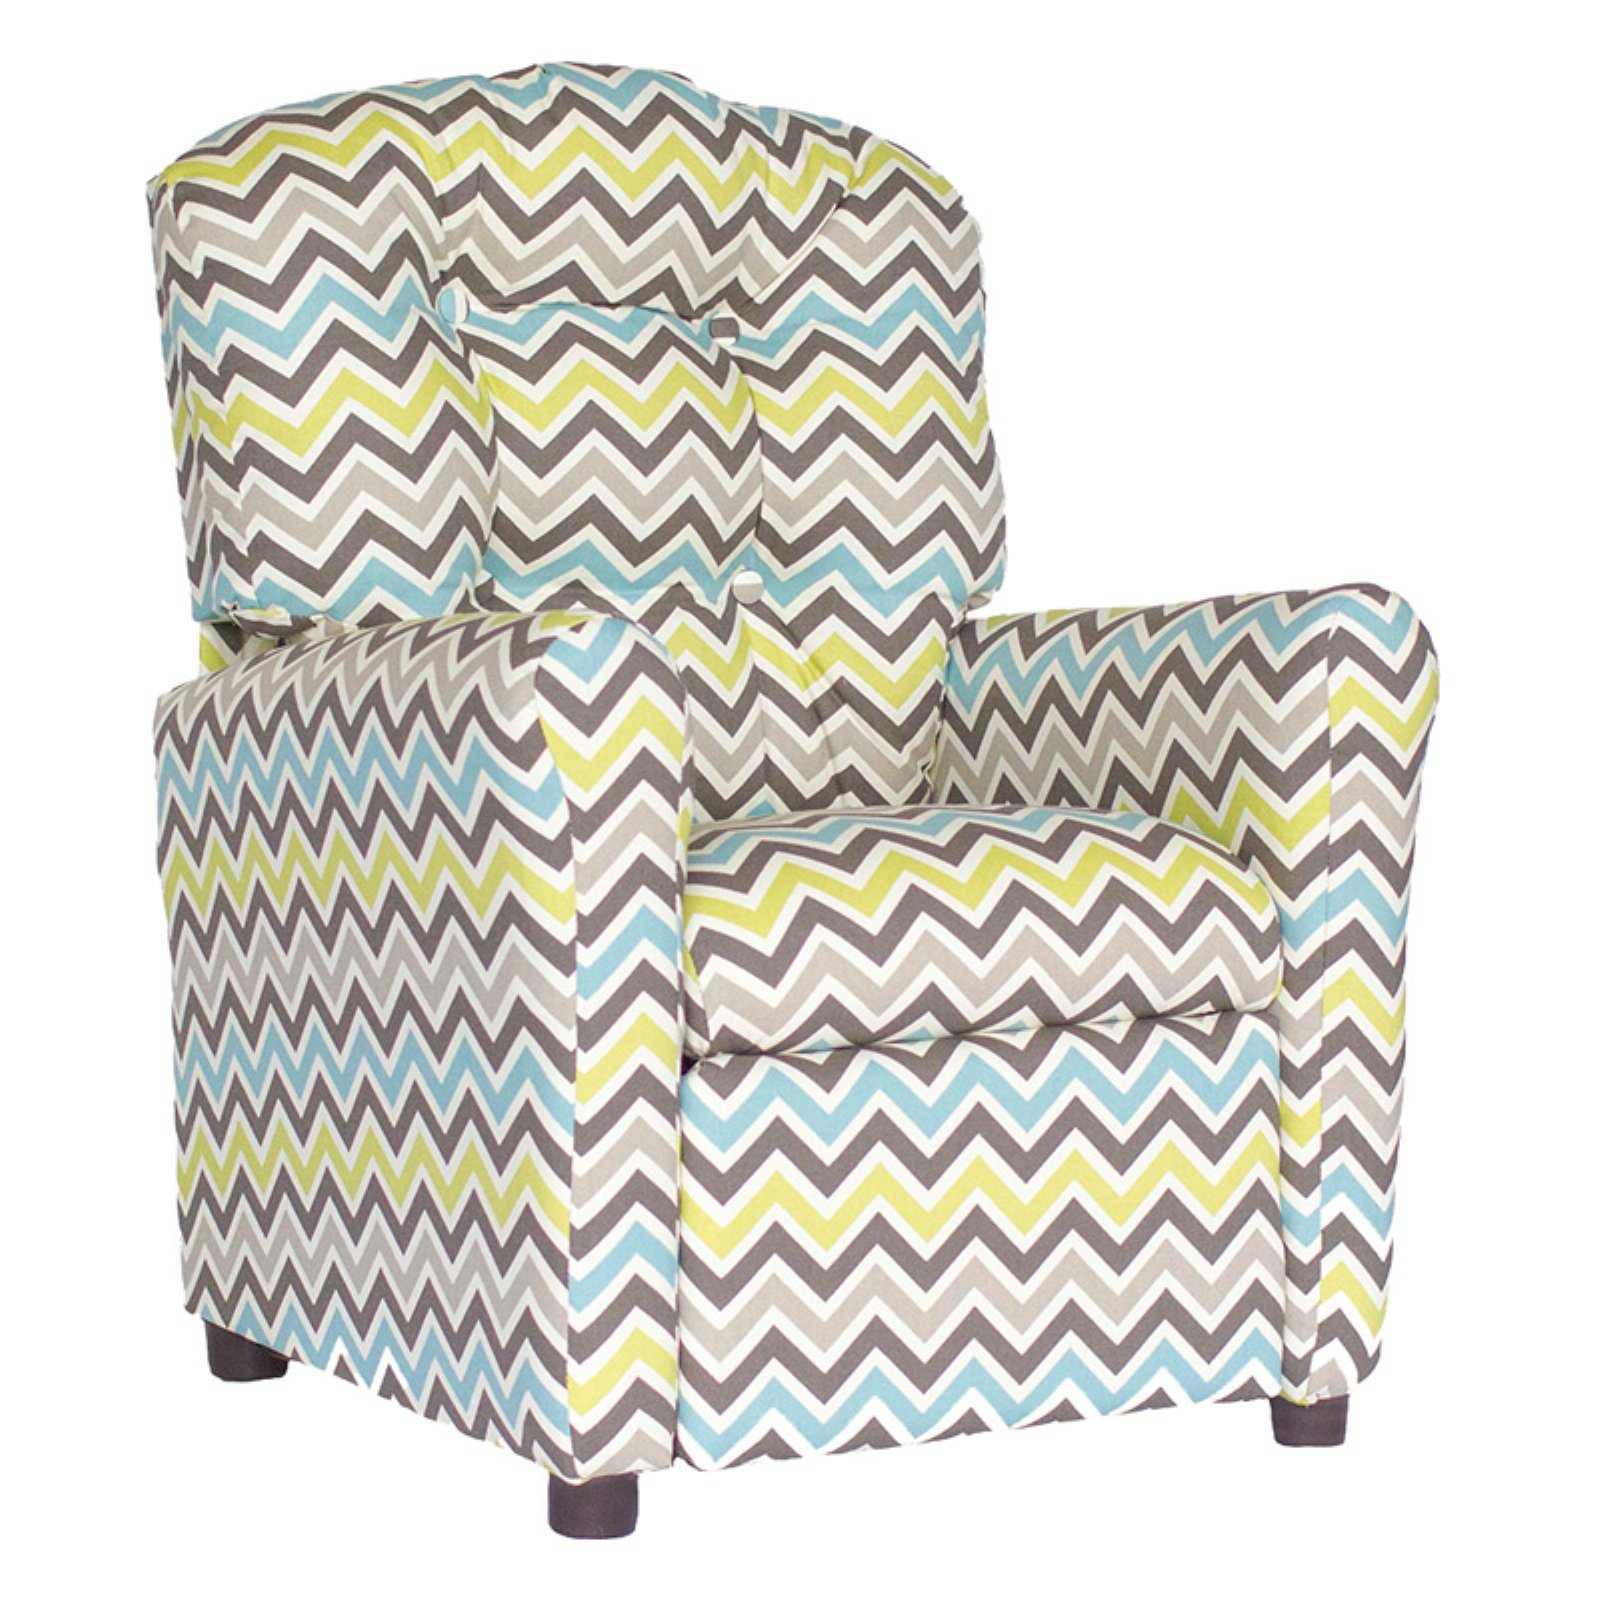 Brazil Furniture Zoom Zoom 4 Button Child Recliner - Mantis